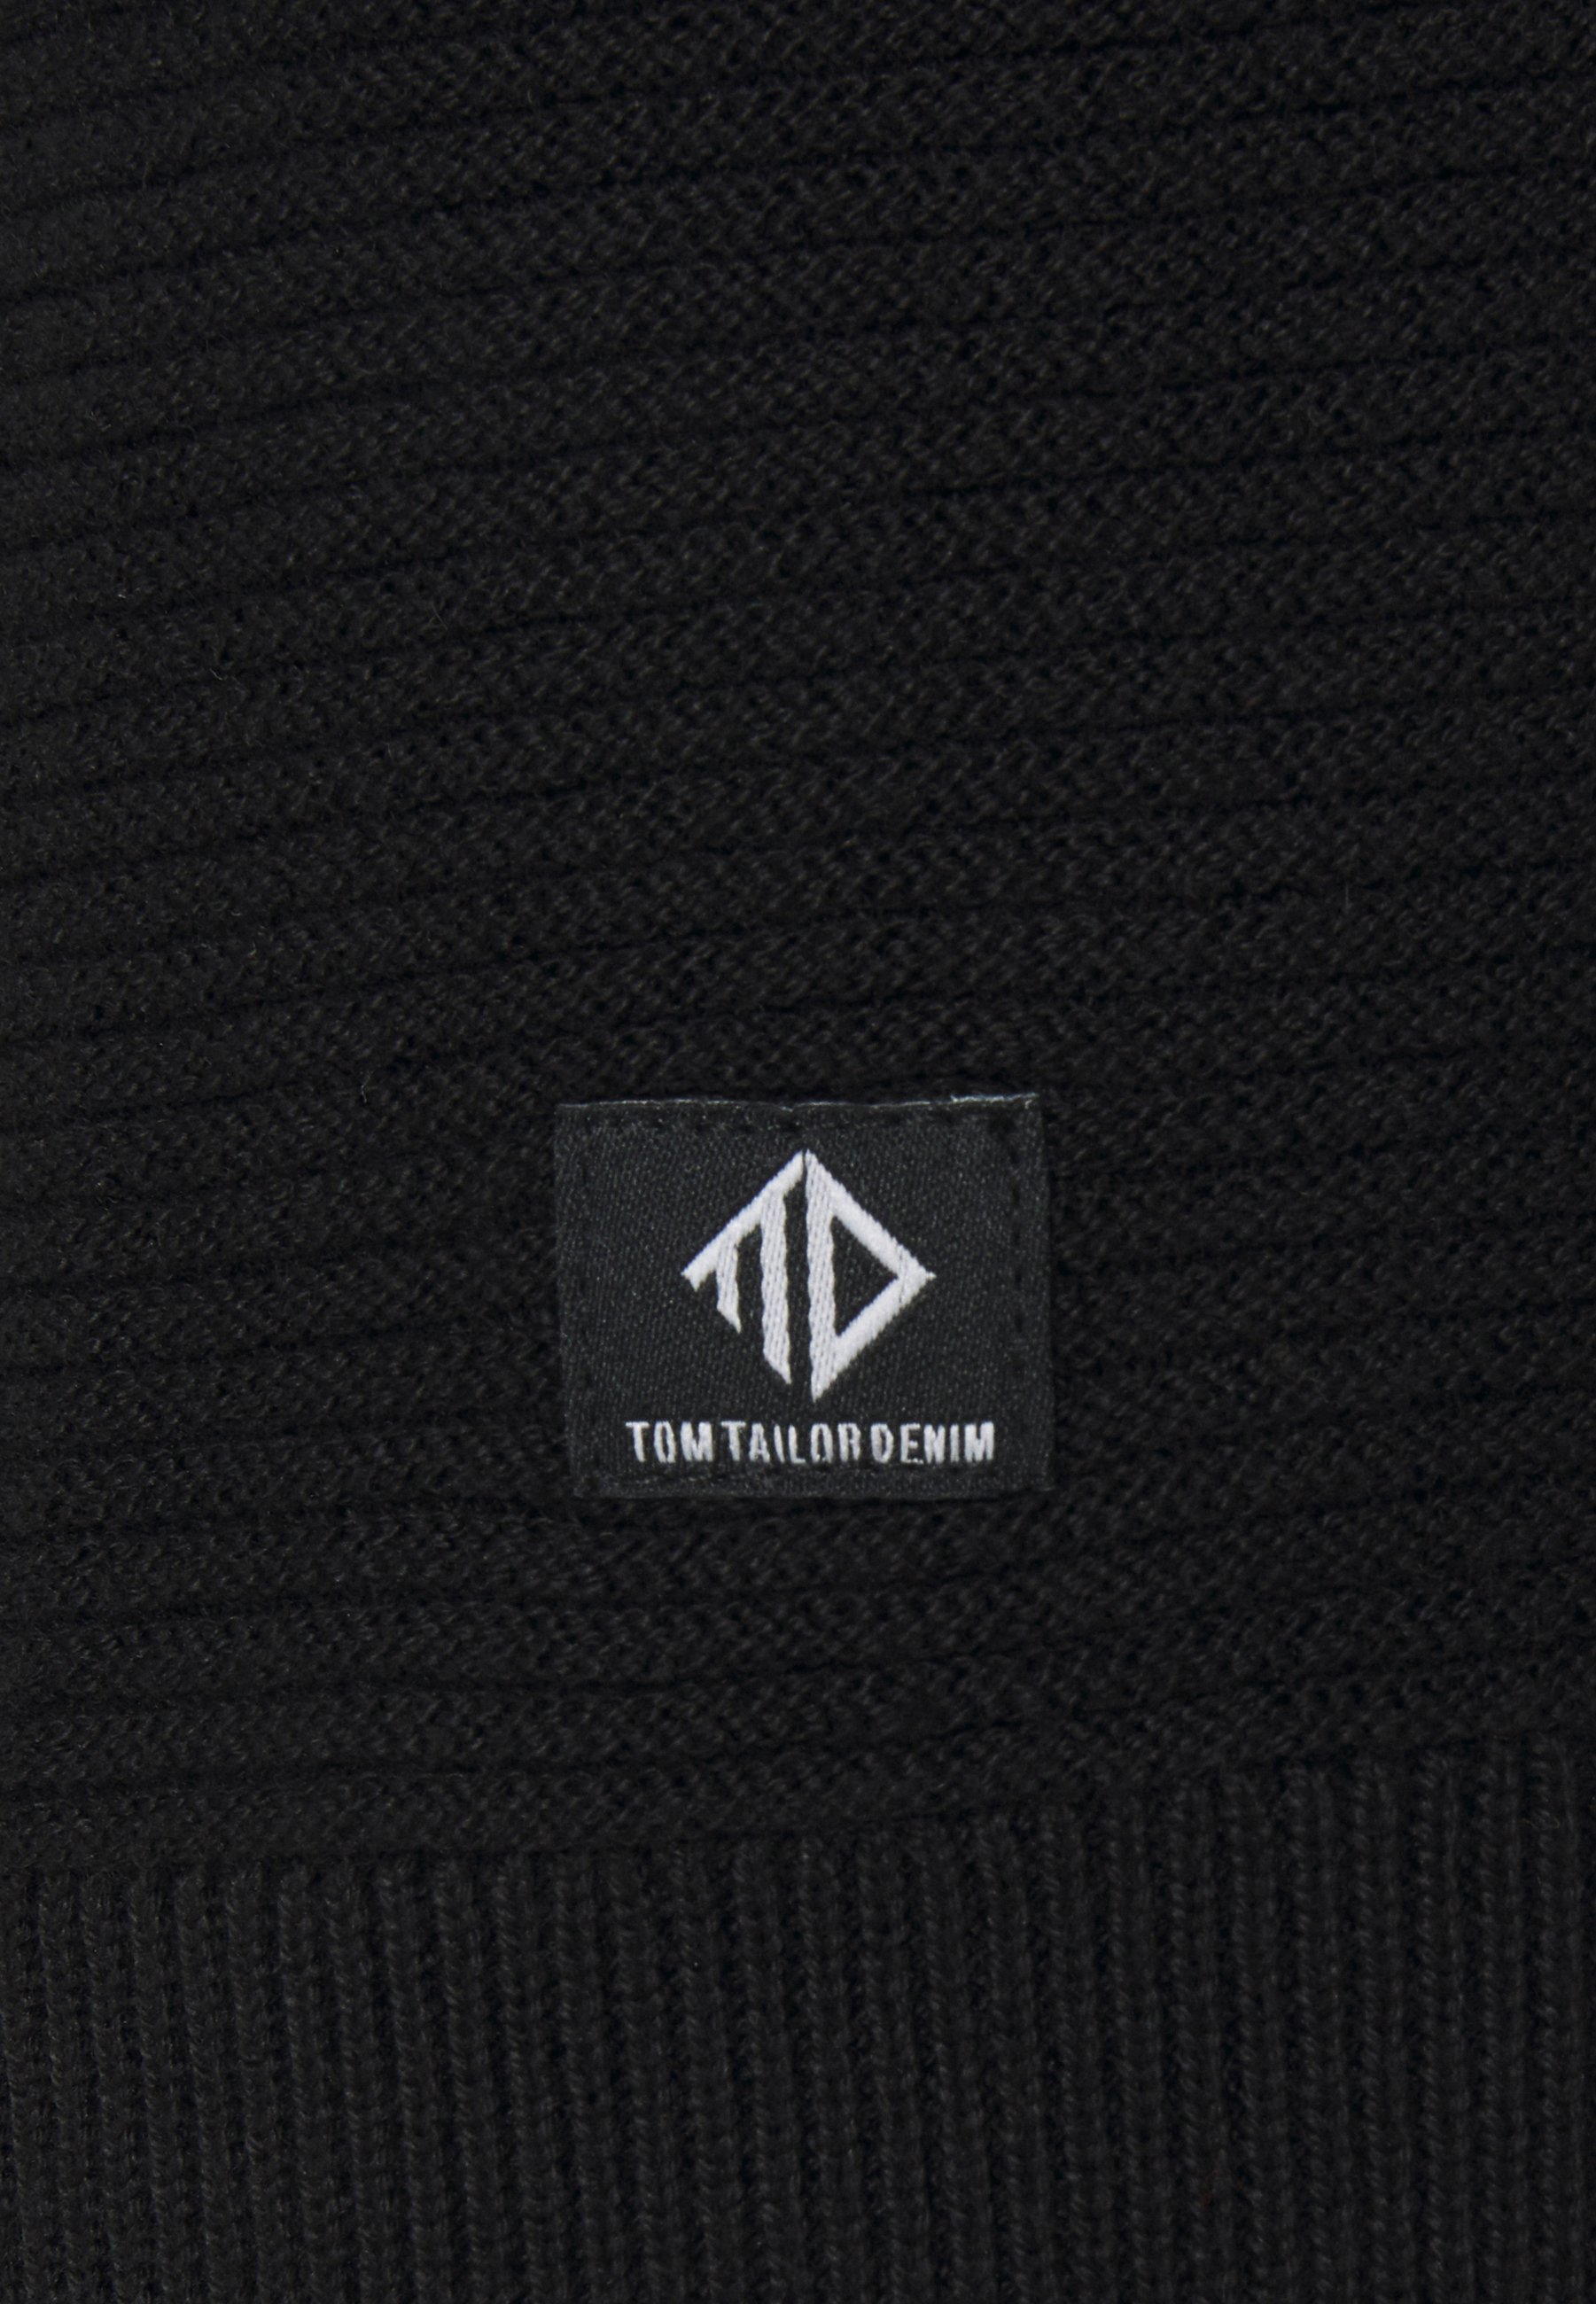 Tom Tailor Denim Sweatshirt - Black